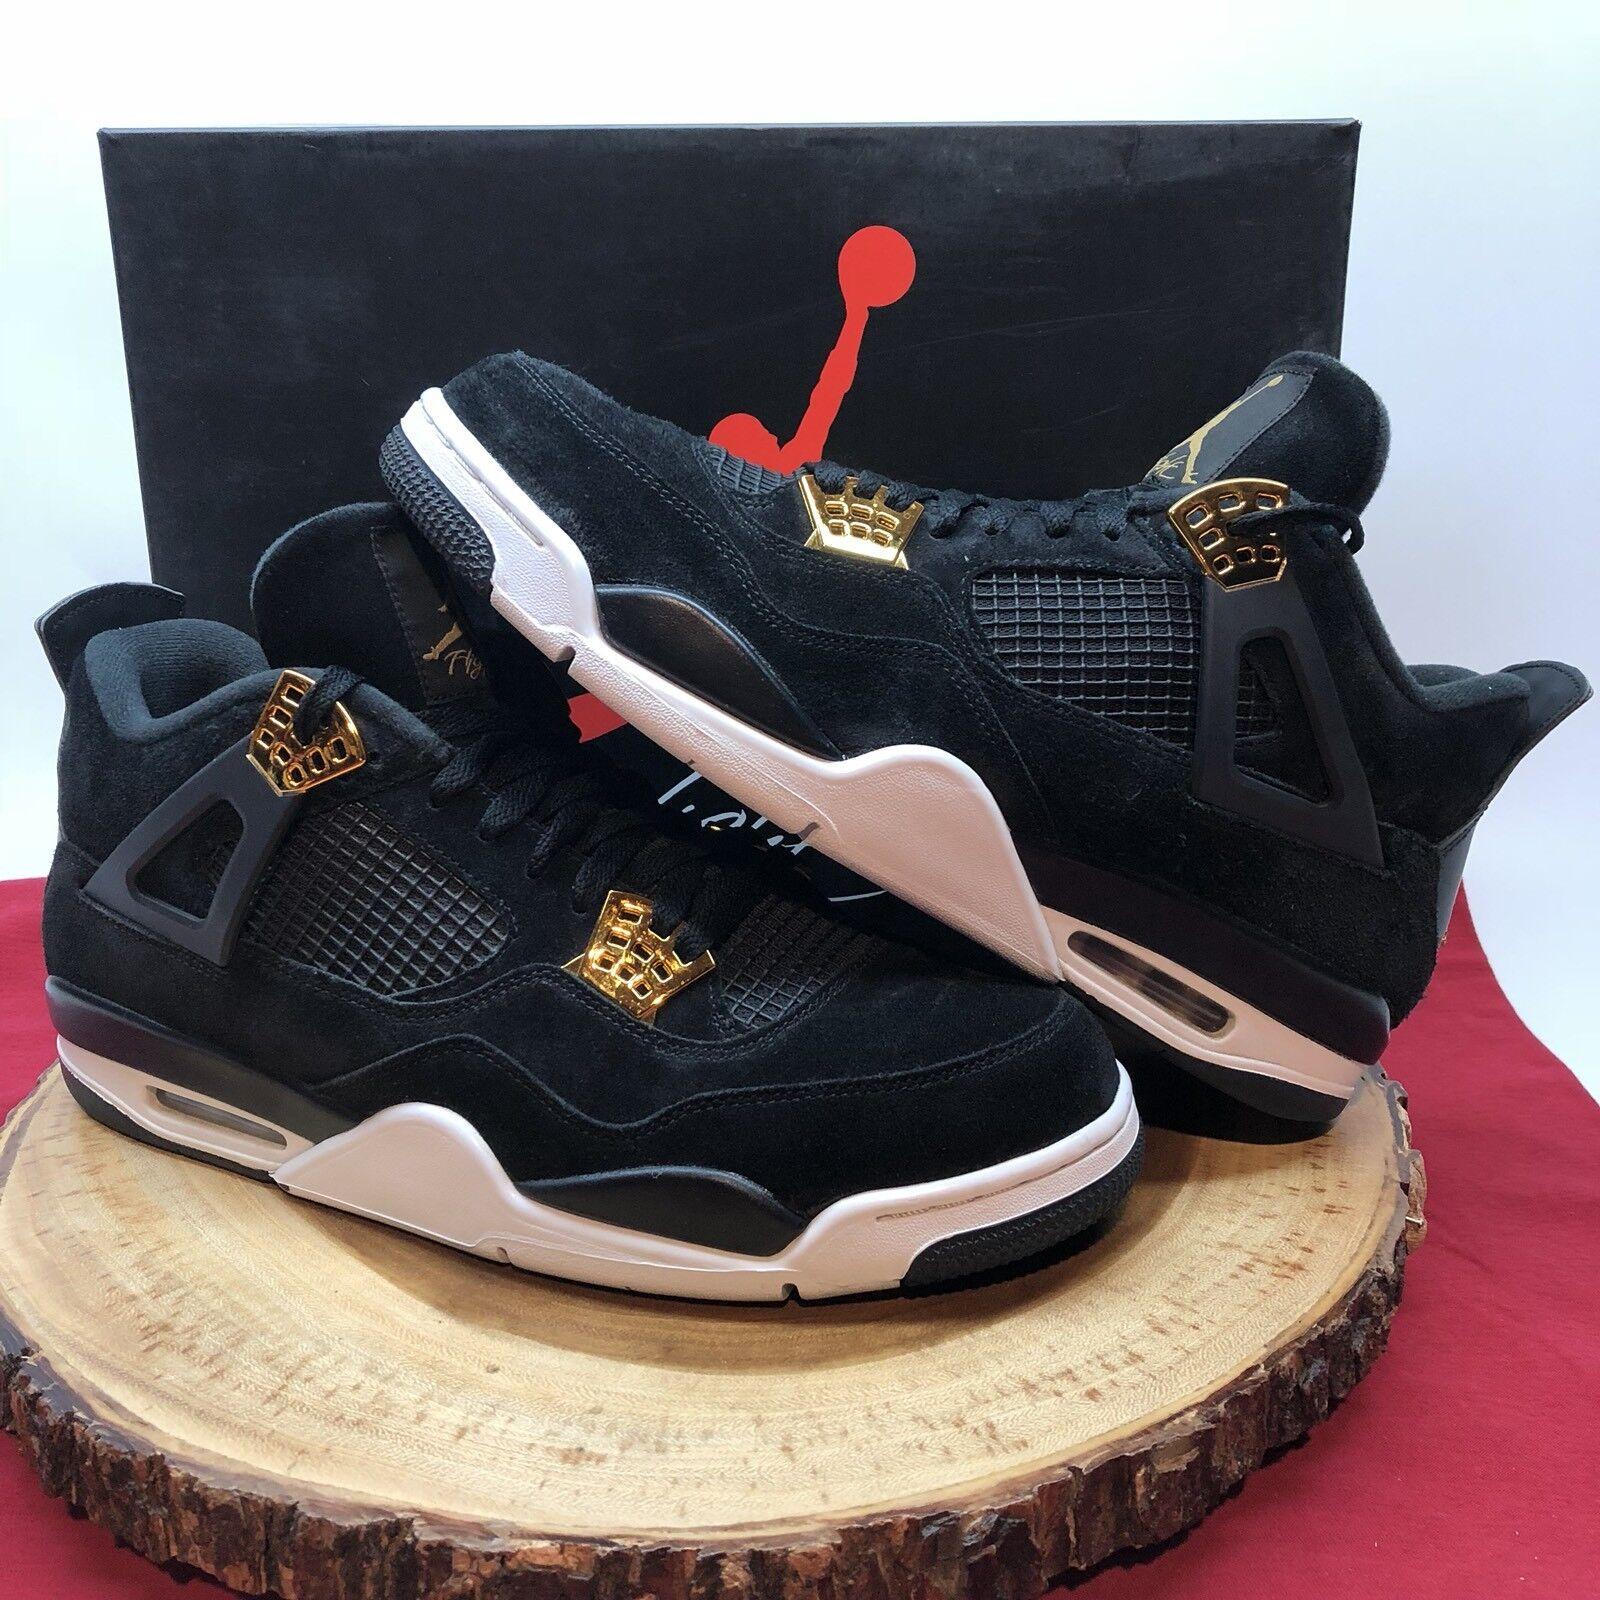 9b6b41df81f0 Nike Air Jordan Jordan Jordan Retro IV Royalty Black Suede Gold Size 13  308497 032 6c5a64